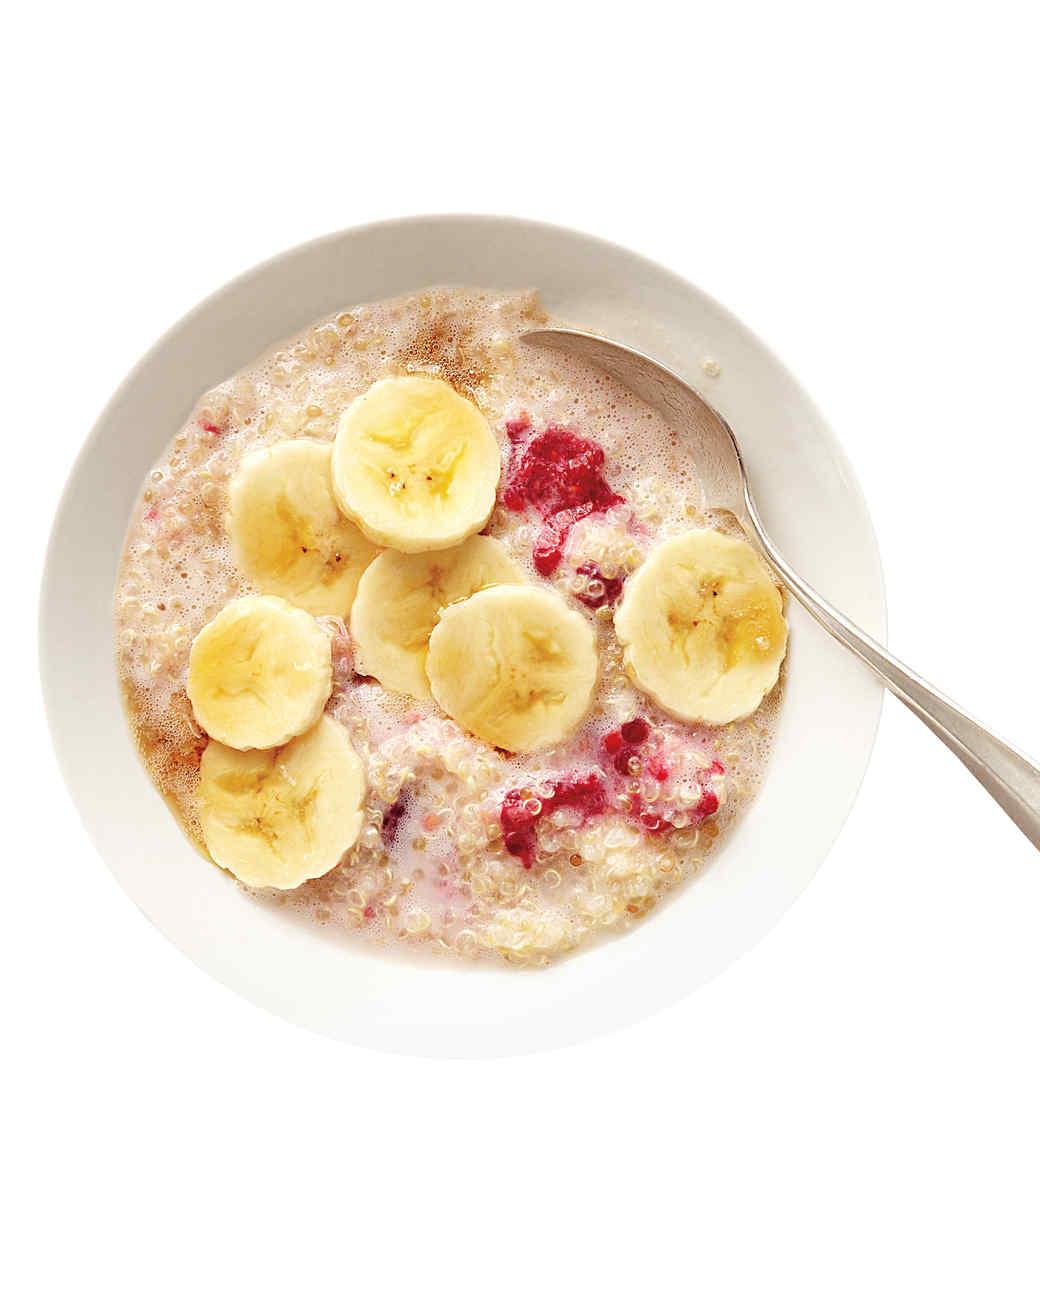 quinoa-cereal-0911mbd107535.jpg